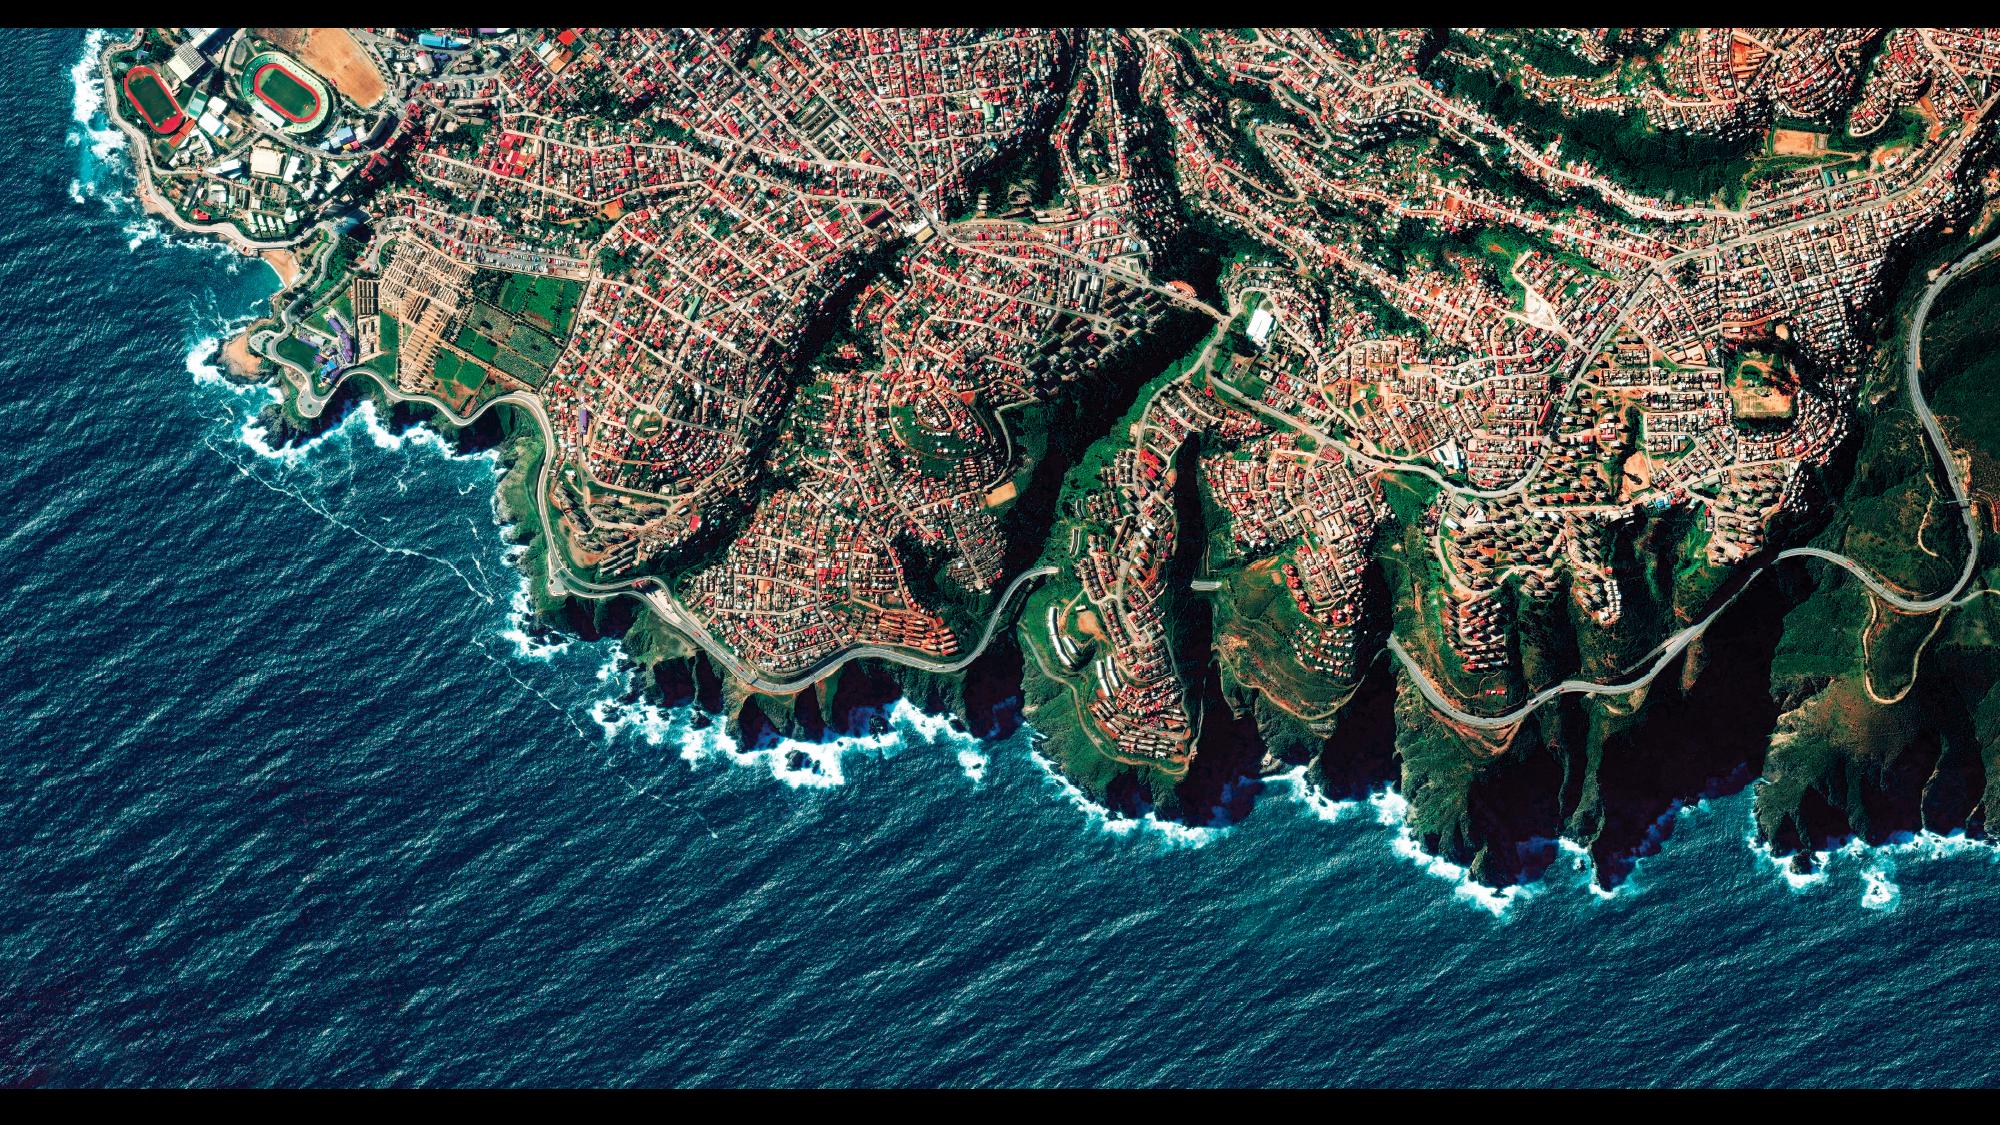 Photos: Satellite images put Earth in new perspective   CNN ... on washington satellite map, california satellite map, nebraska satellite map, los angeles satellite map, texas satellite map, oahu satellite map, salt lake city satellite map,